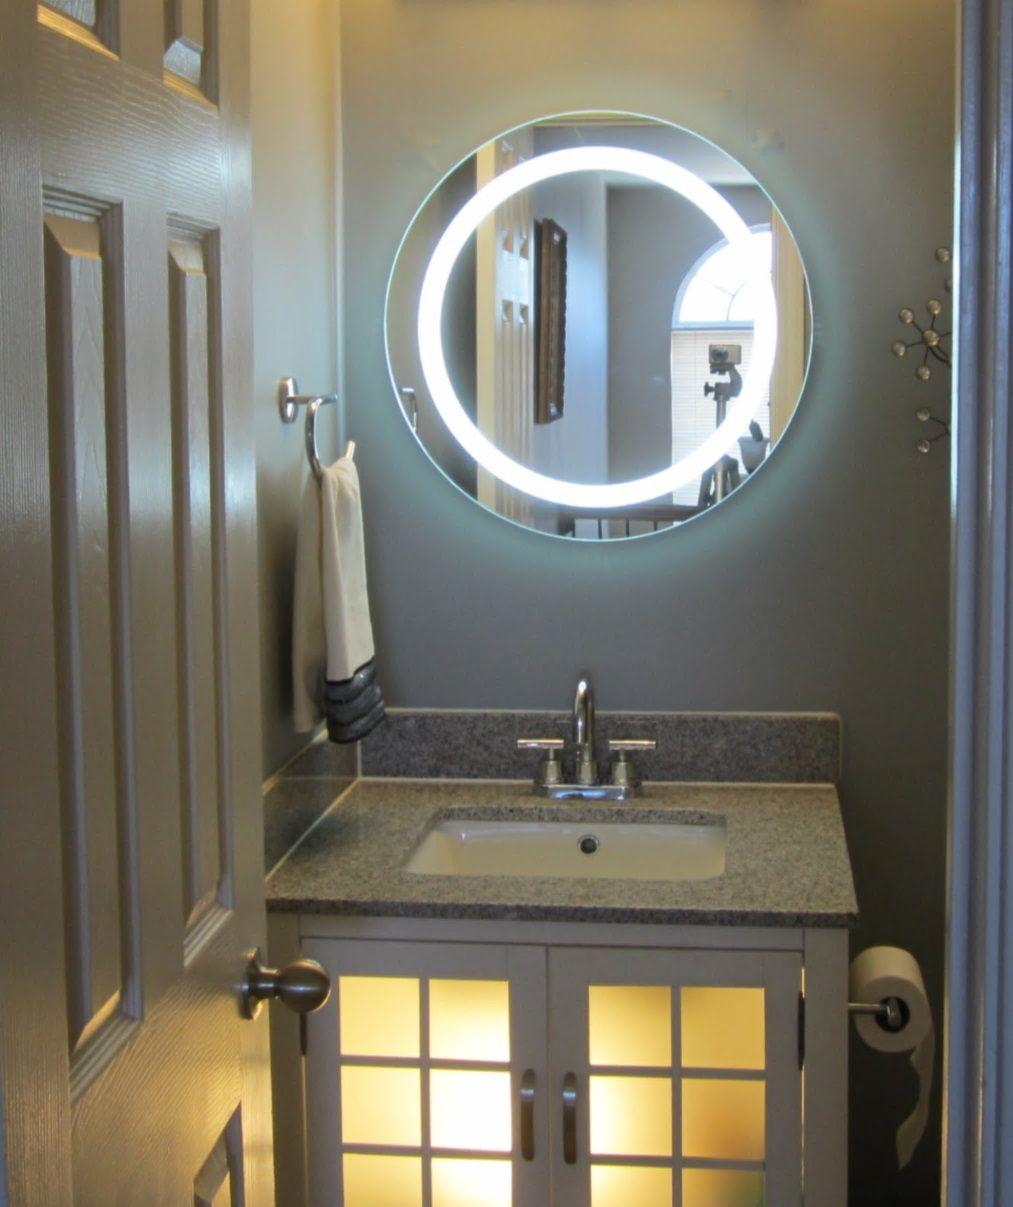 Slowings Com Round Mirror Bathroom Lighted Vanity Mirror Wall Mounted Light